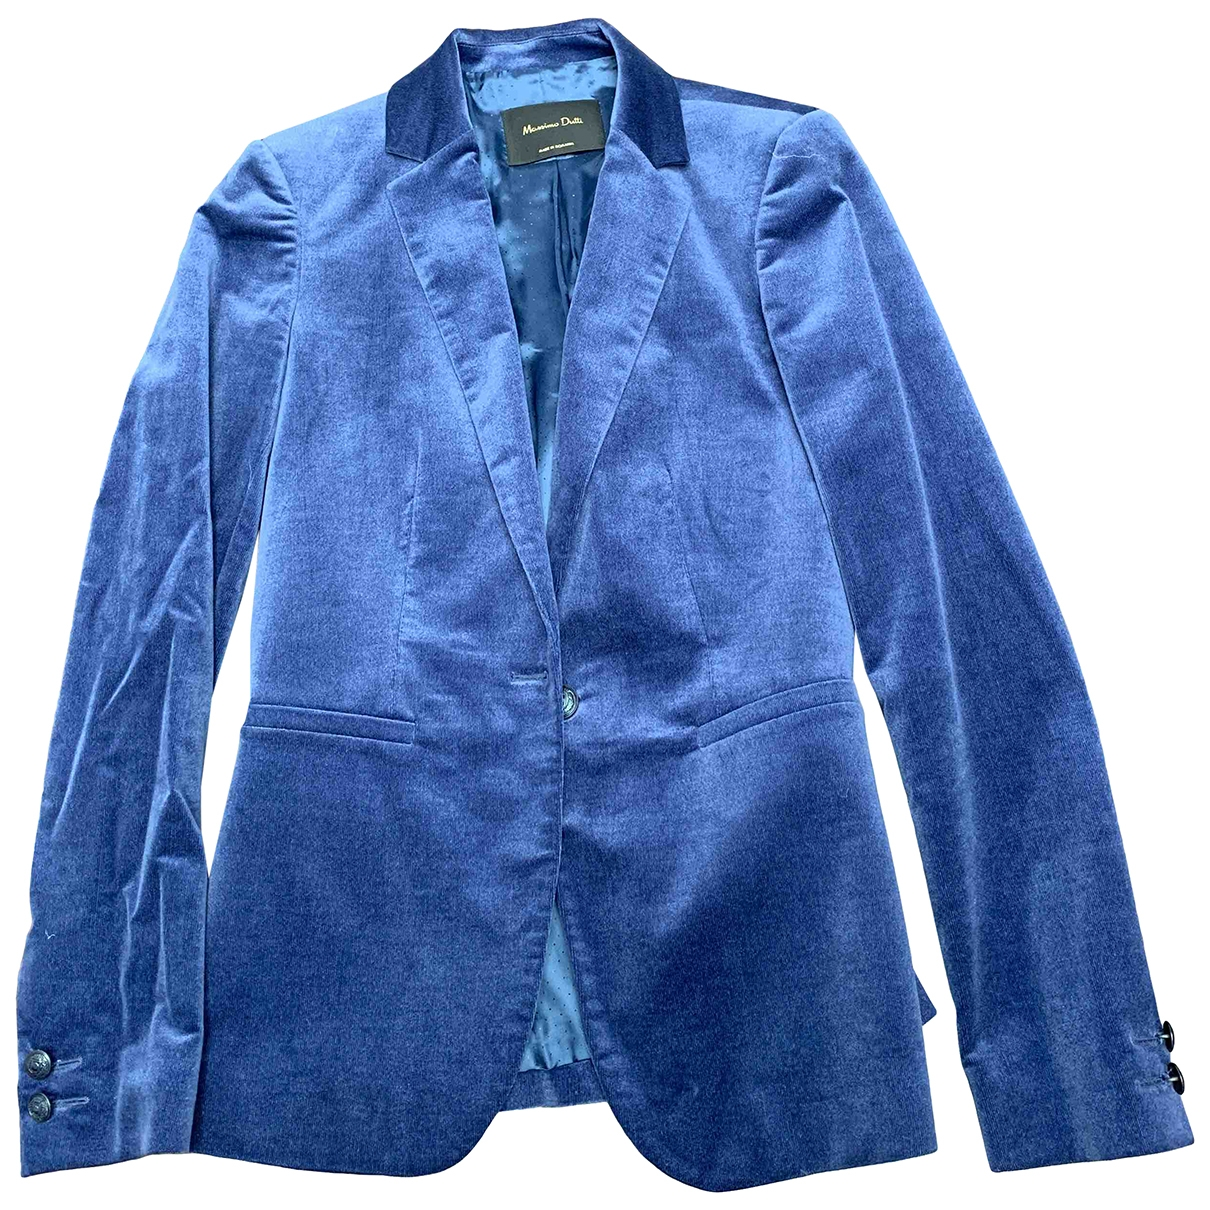 Massimo Dutti \N Jacke in  Blau Baumwolle